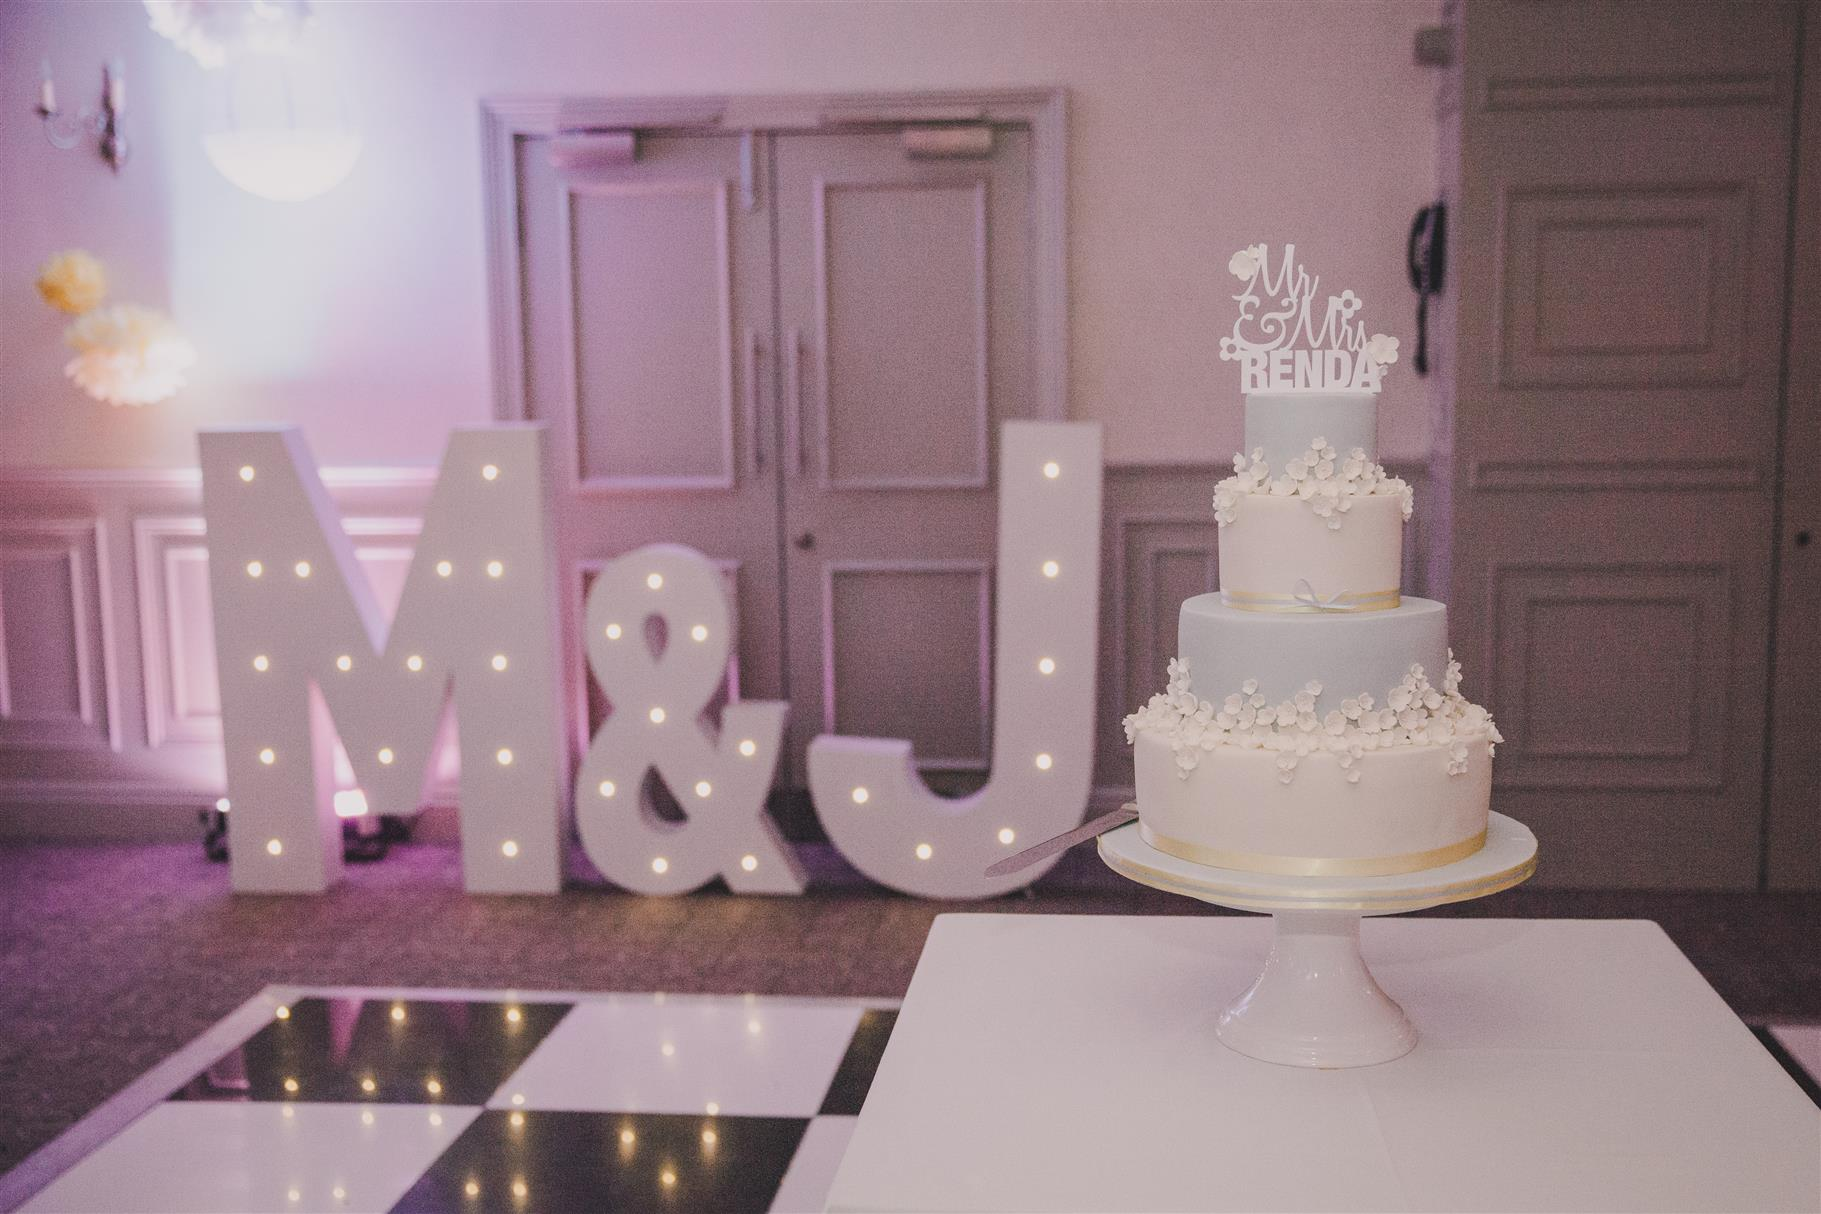 Wedding Cake - A Spring 1960s Inspired Wedding